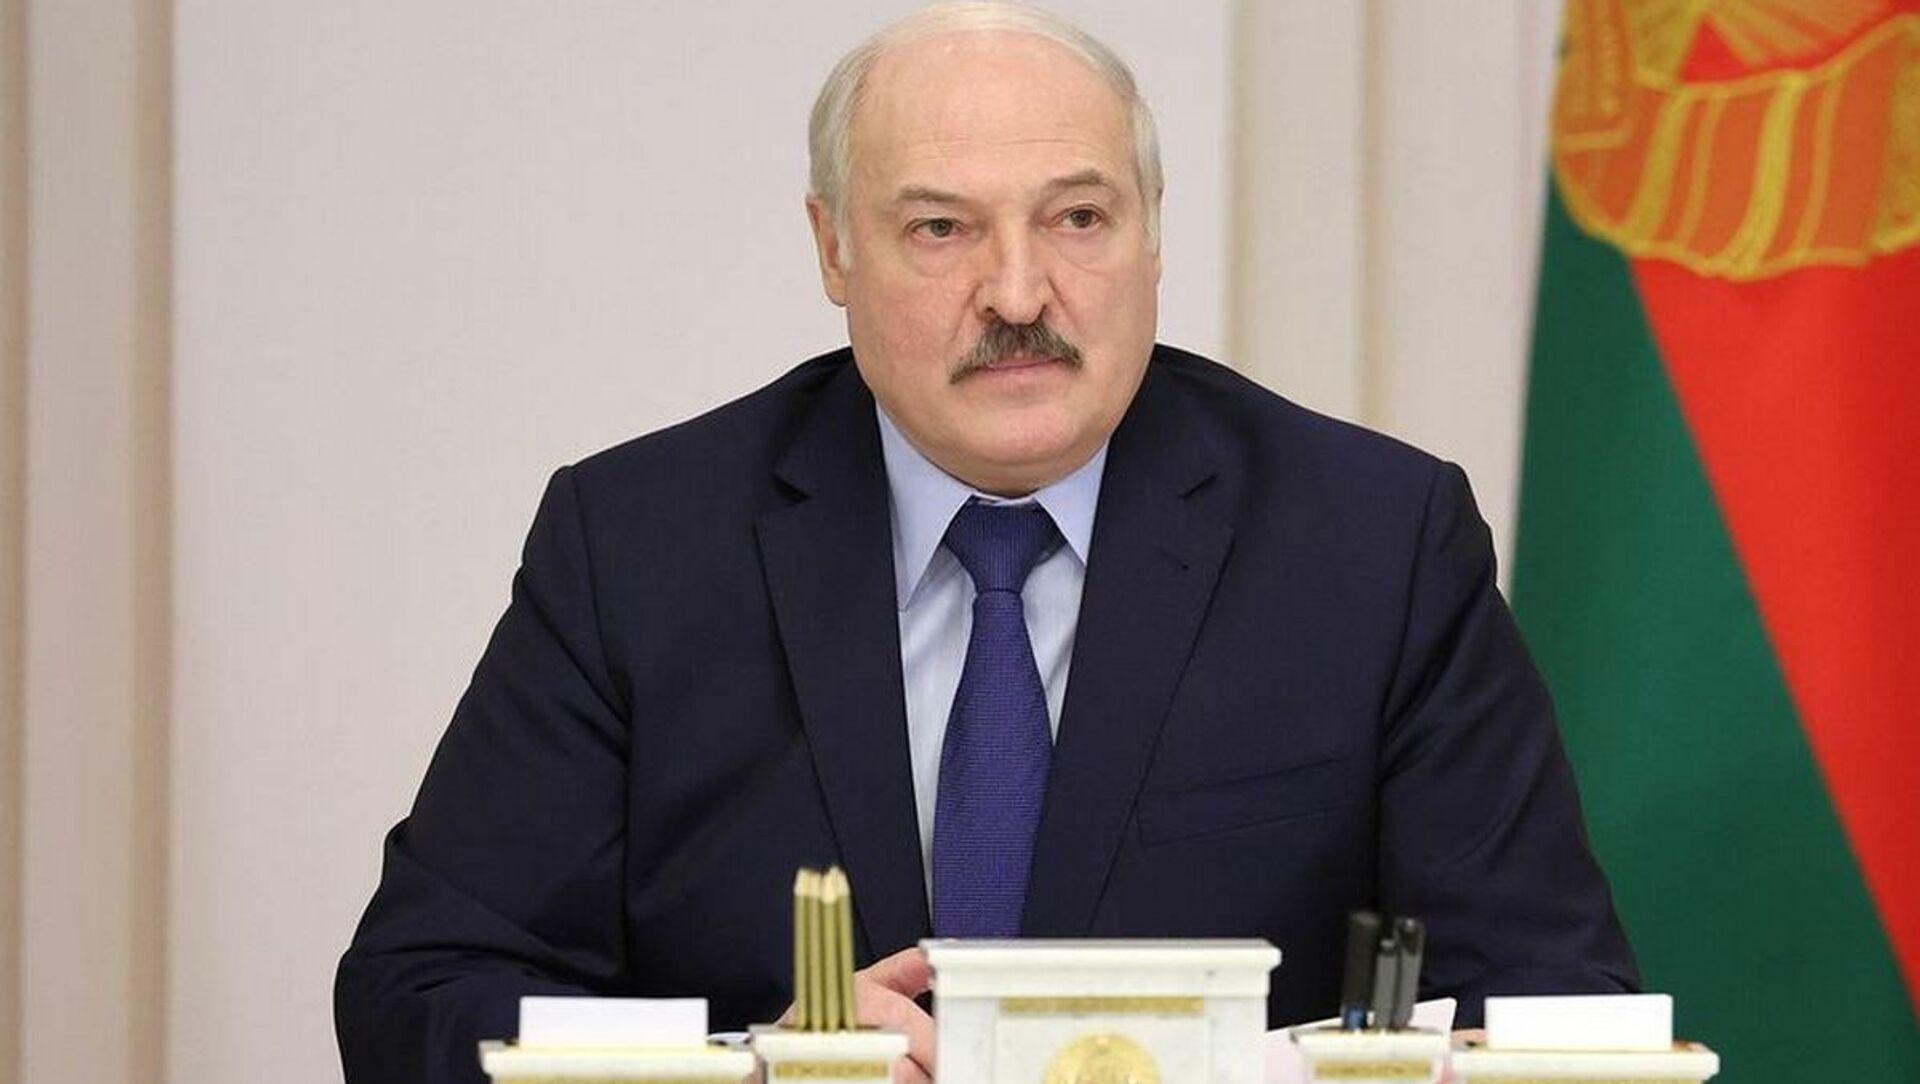 Президент Беларуси Александр Лукашенко - Sputnik Беларусь, 1920, 19.04.2021